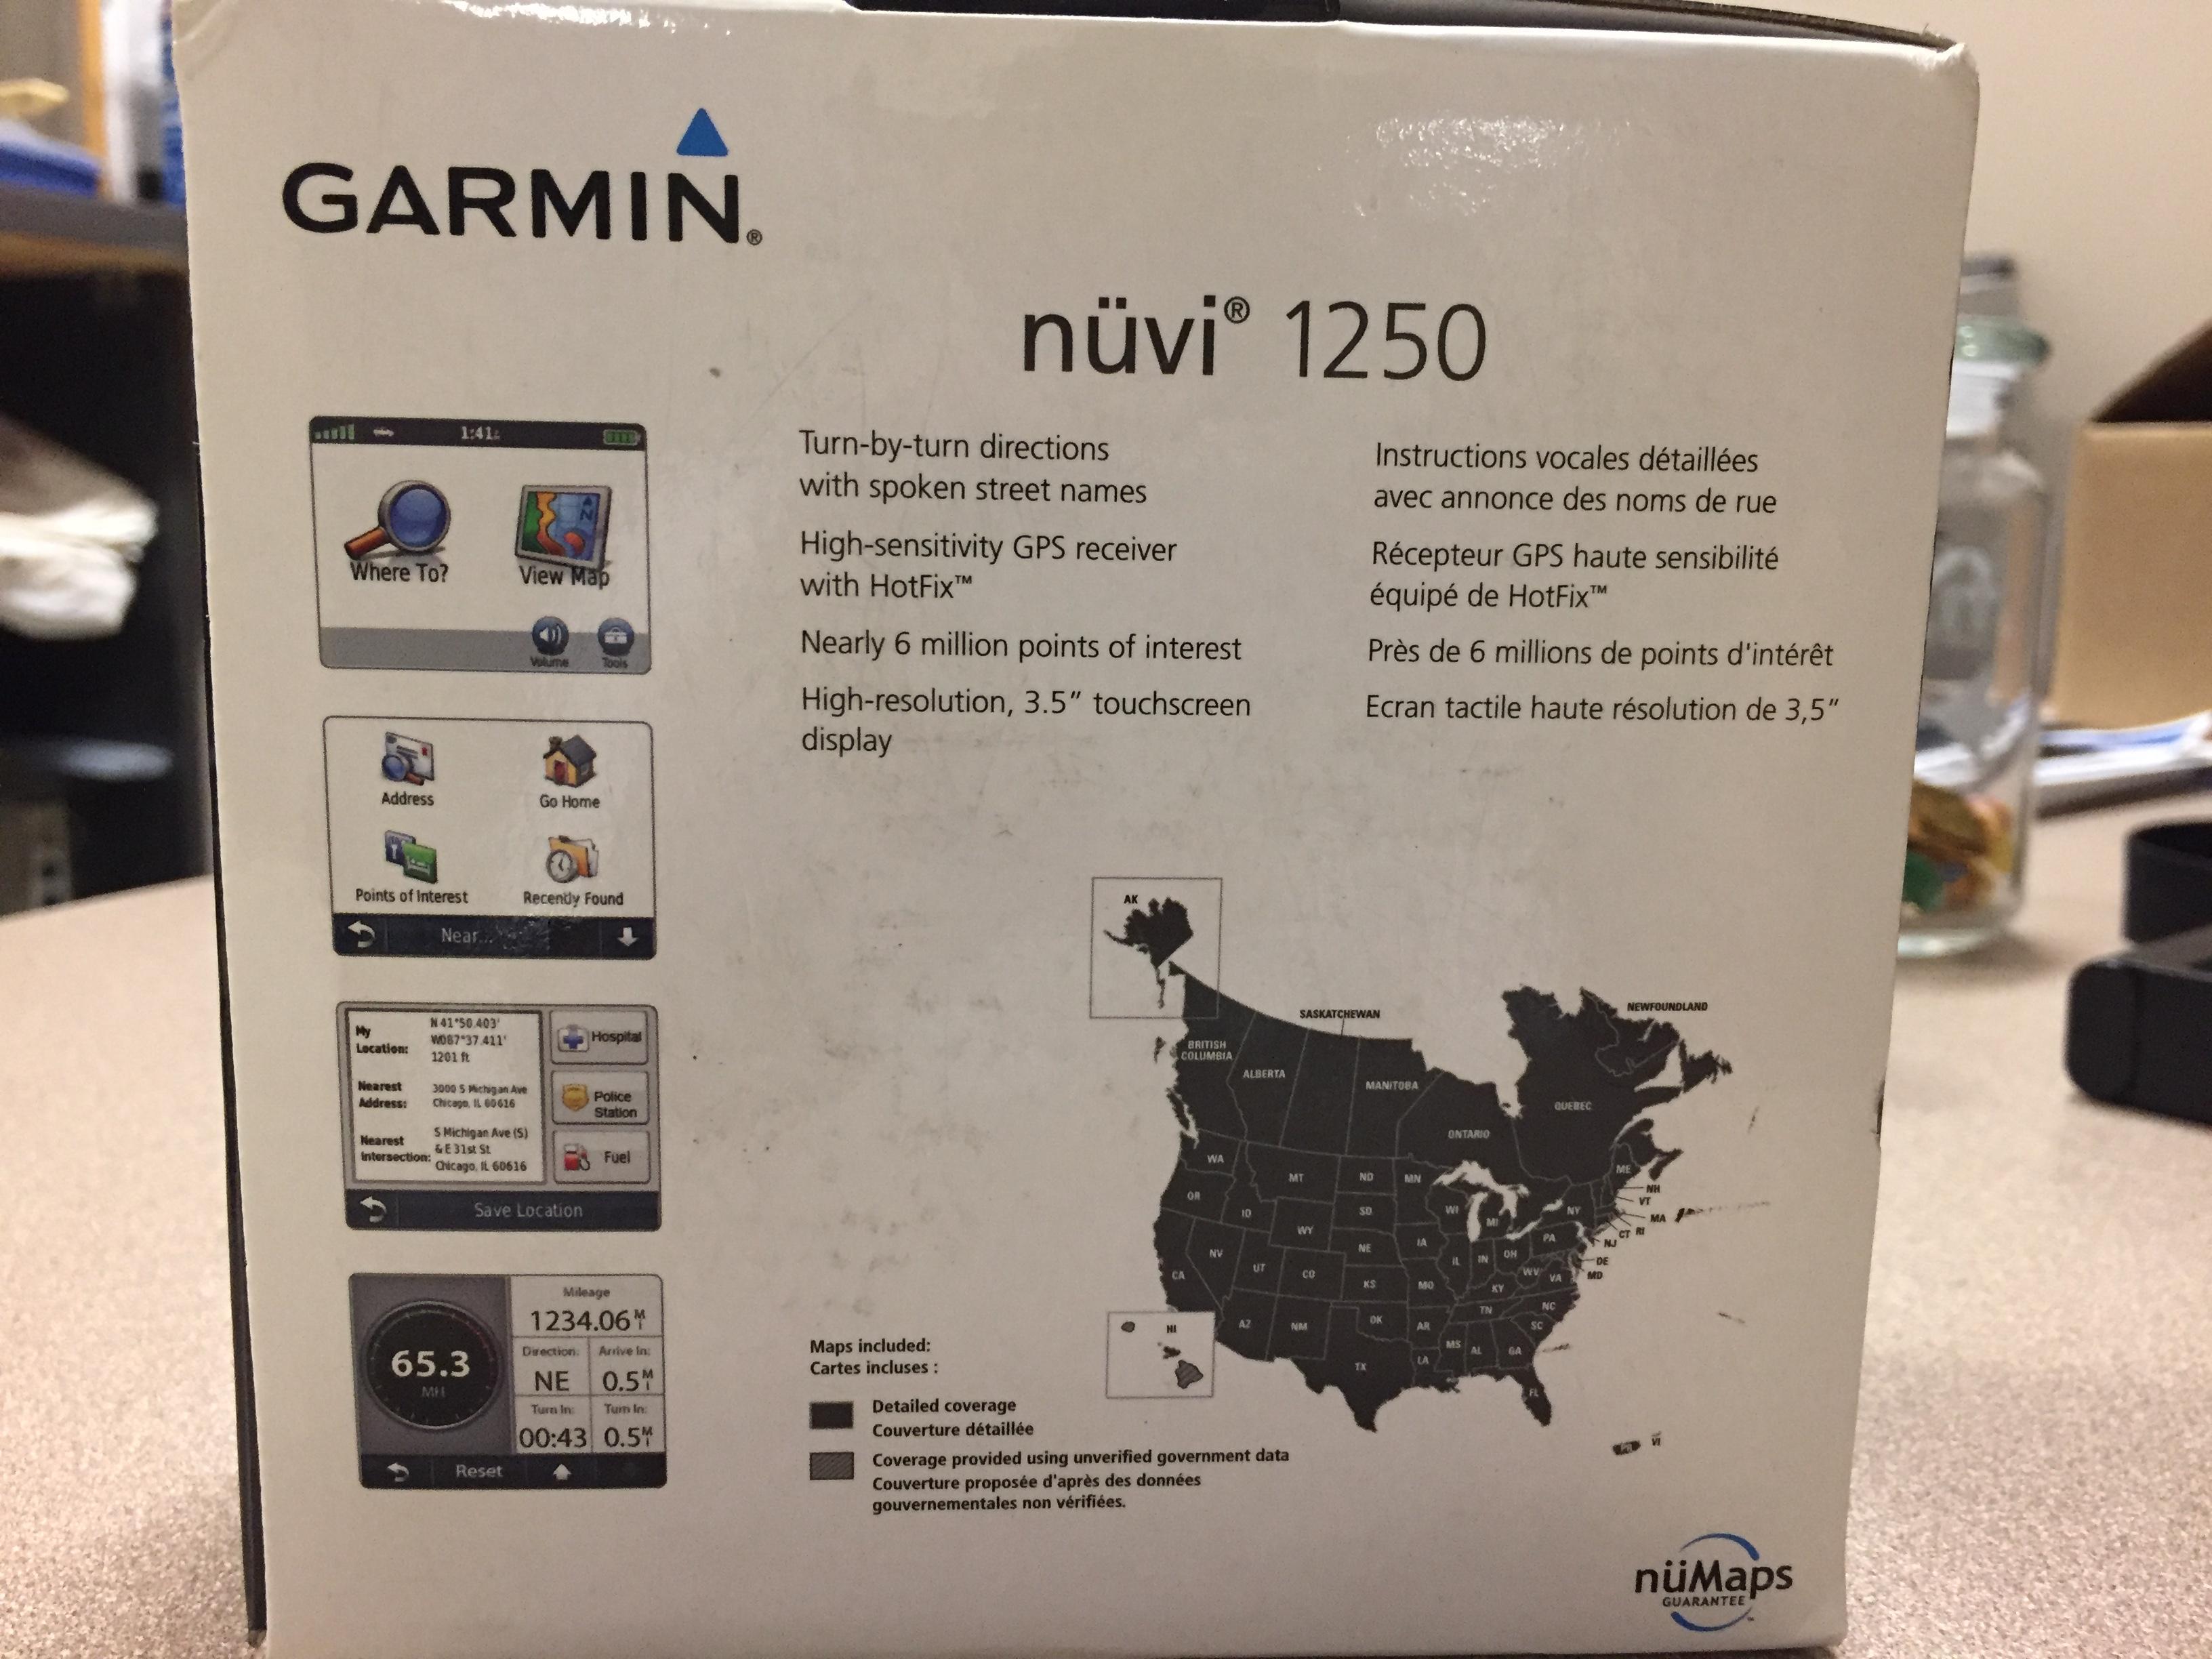 Garmin Navigation